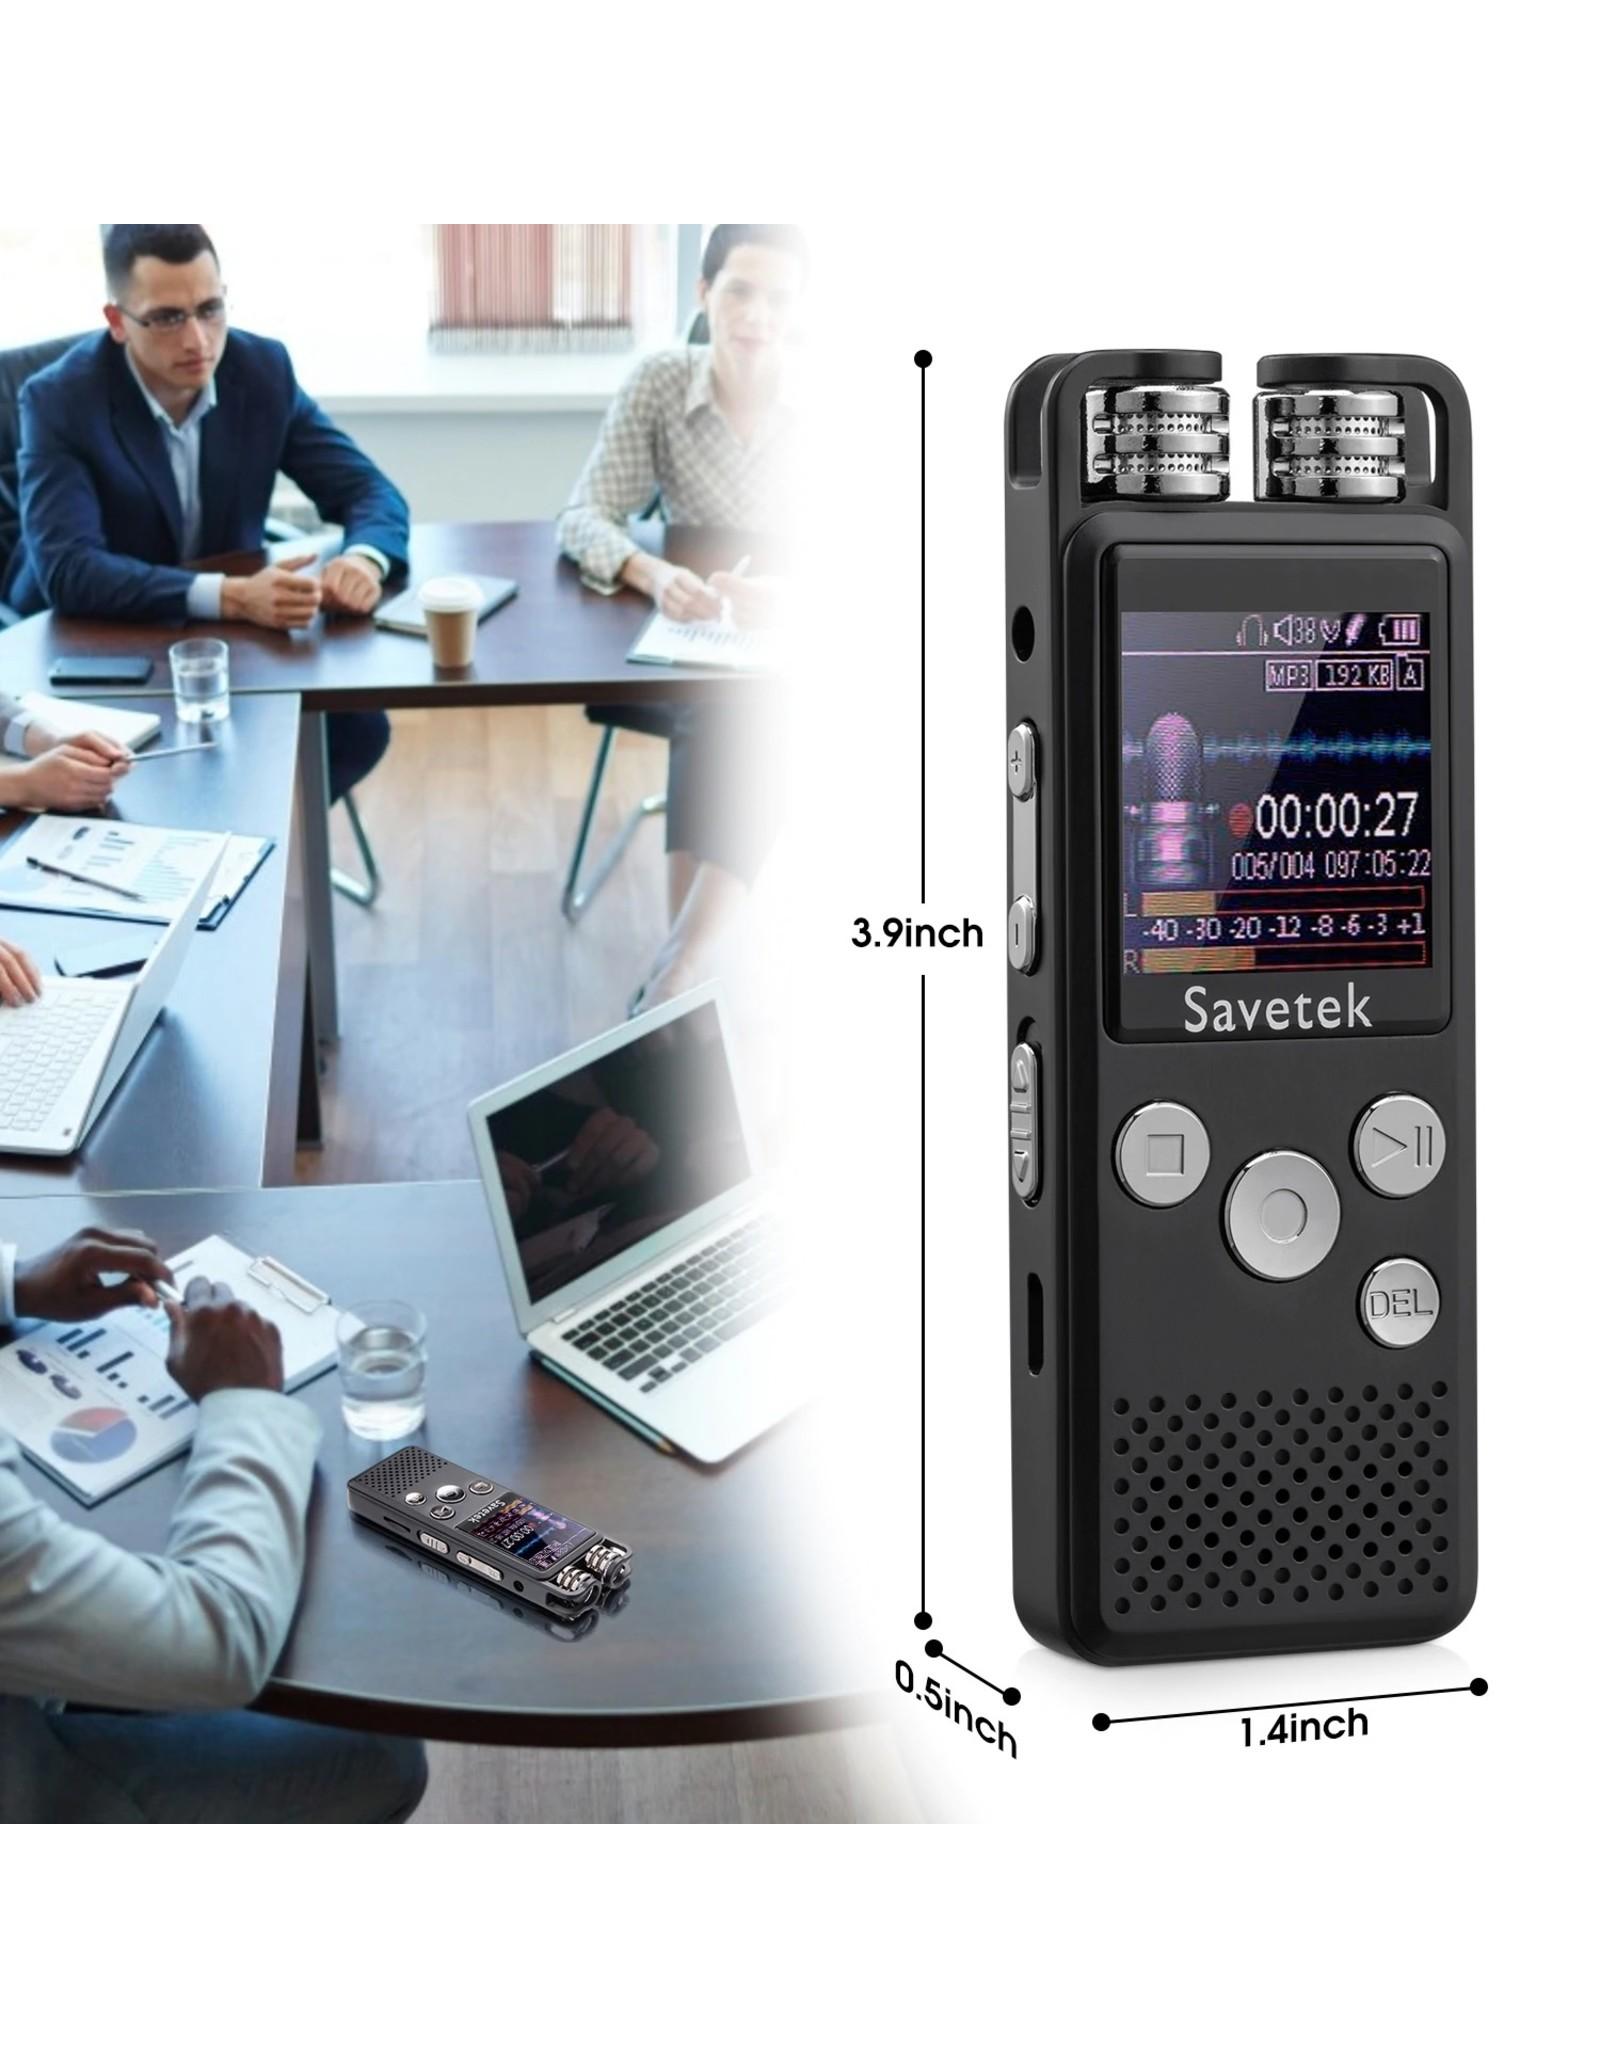 Professionele Voice - Activated Digital Audio Voice Recorder 4GB - Tijdregistratie Wachtwoordbeveiliging